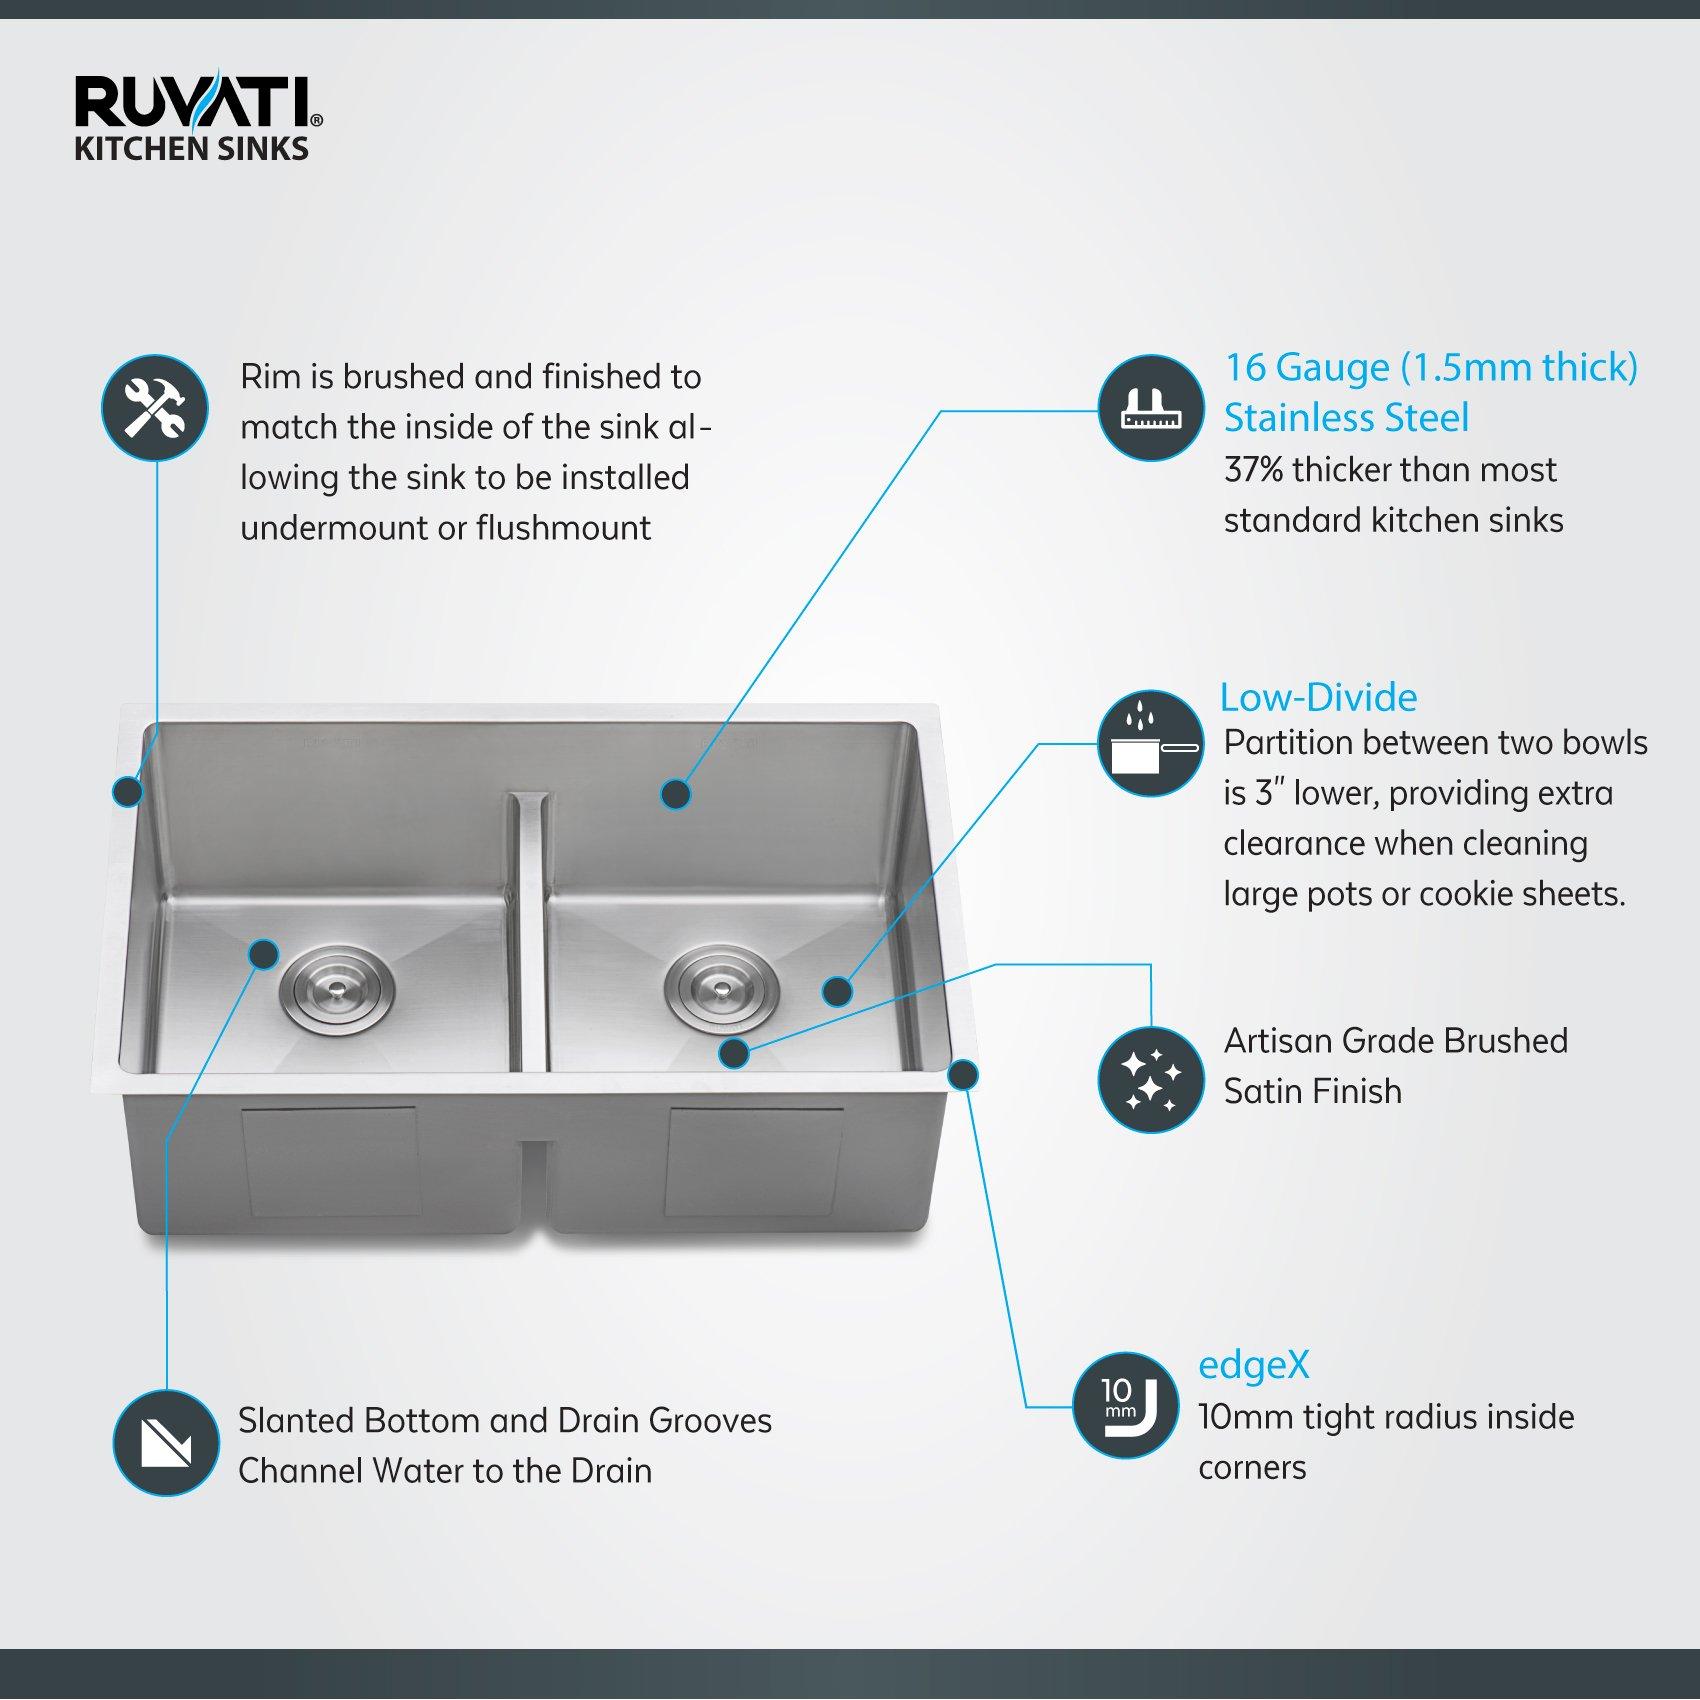 Ruvati 32-inch Low-Divide Undermount Tight Radius 50/50 Double Bowl 16 Gauge Stainless Steel Kitchen Sink - RVH7411 by Ruvati (Image #2)